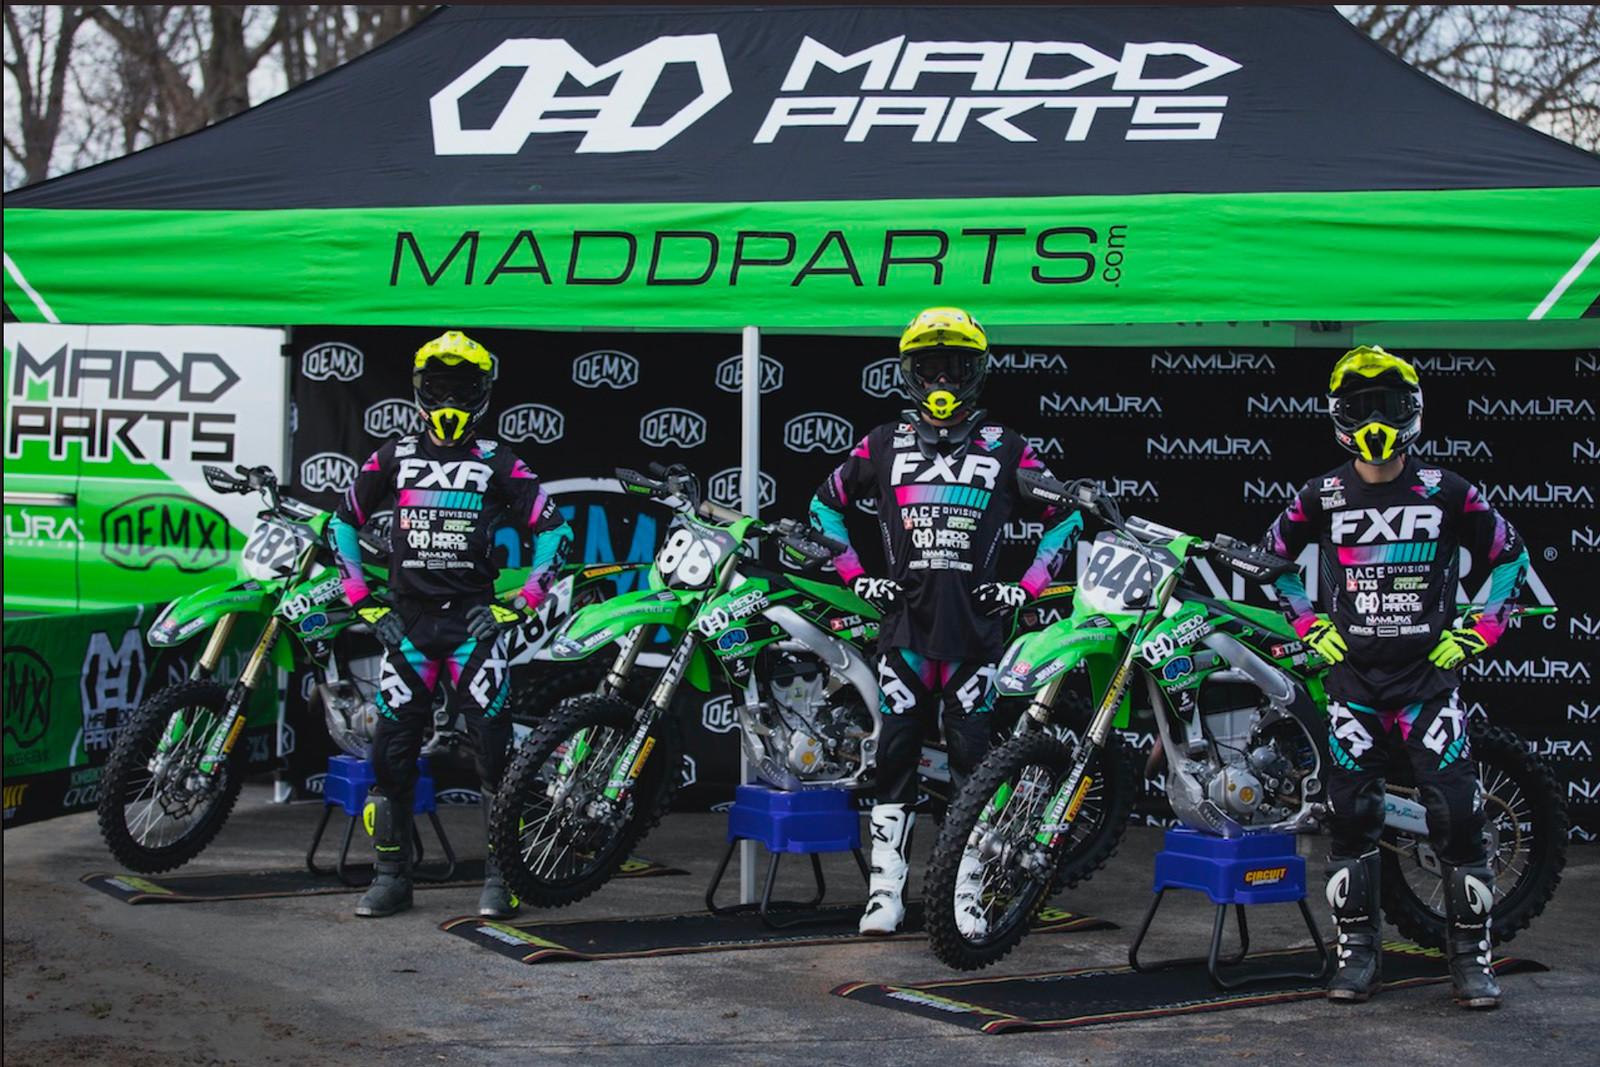 Madd Parts/Double Eagle MX/Namura Technologies Kawasaki will field a three-rider team in 2021. | Photo: Jason Watkins